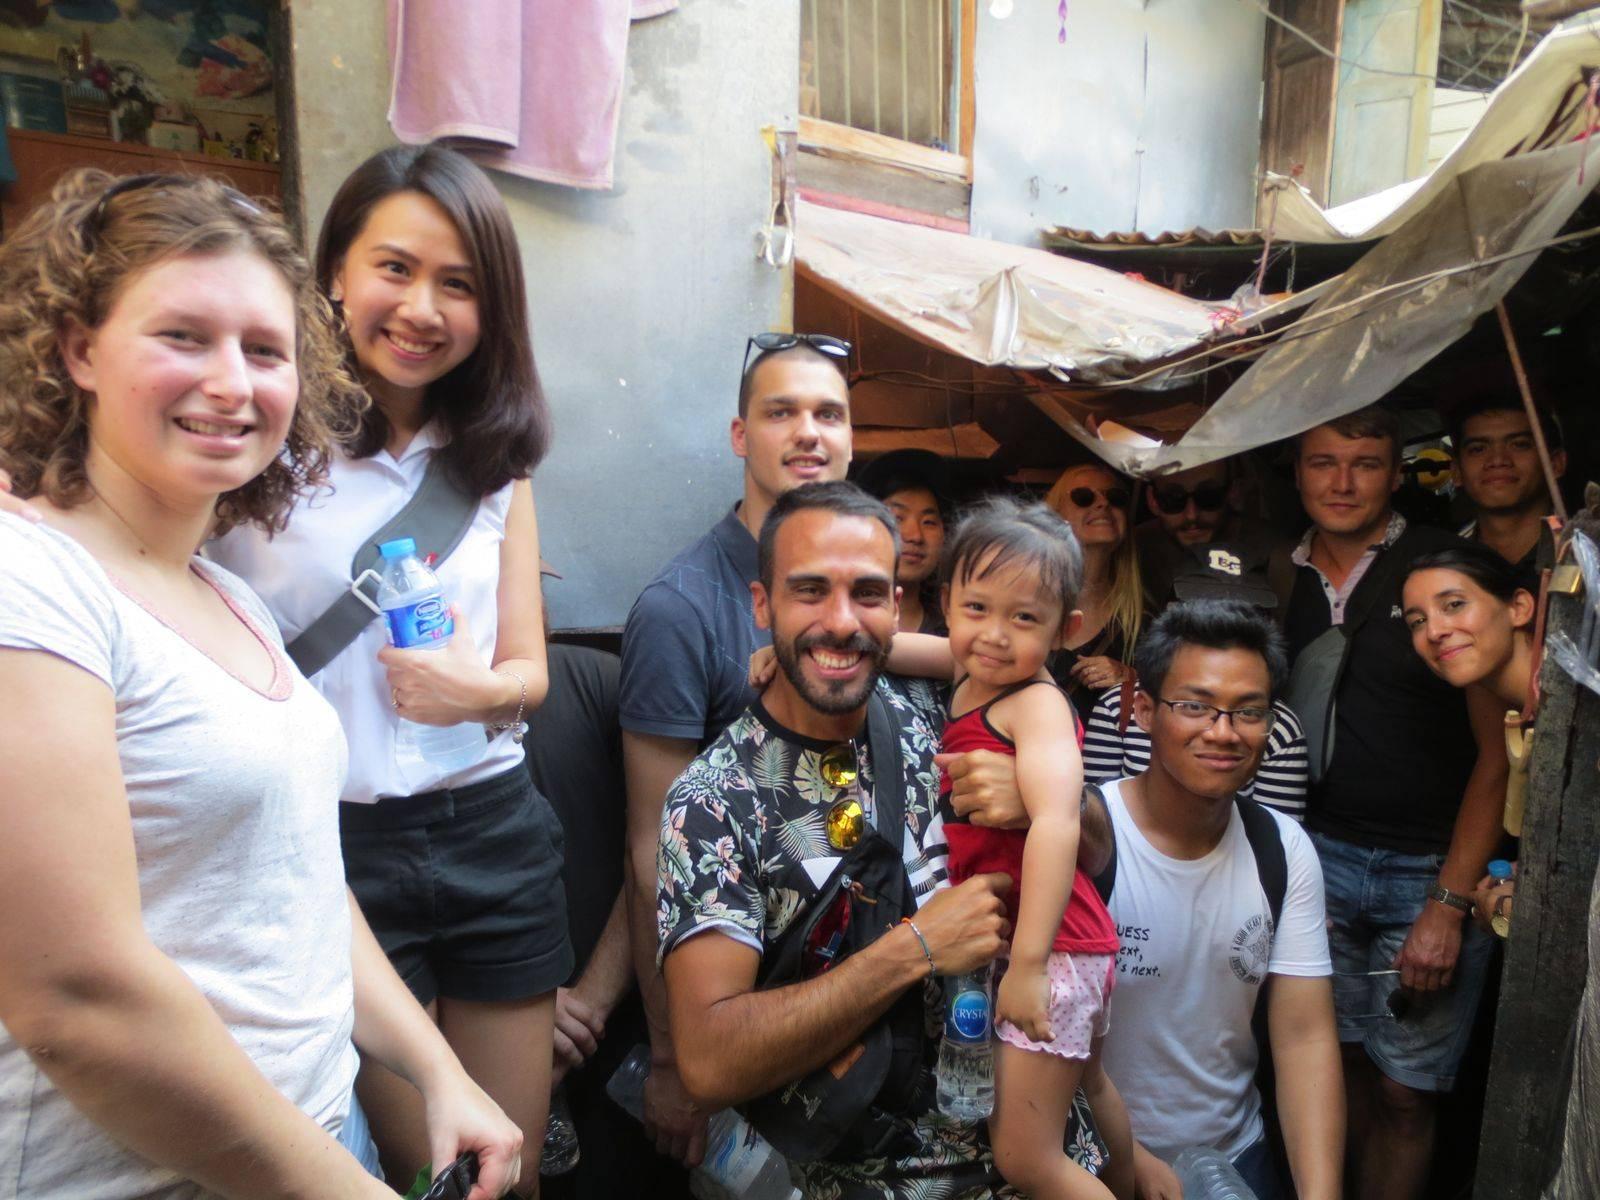 Explore Monk Bowl Village (Baan Bat) and Rattanakosin island